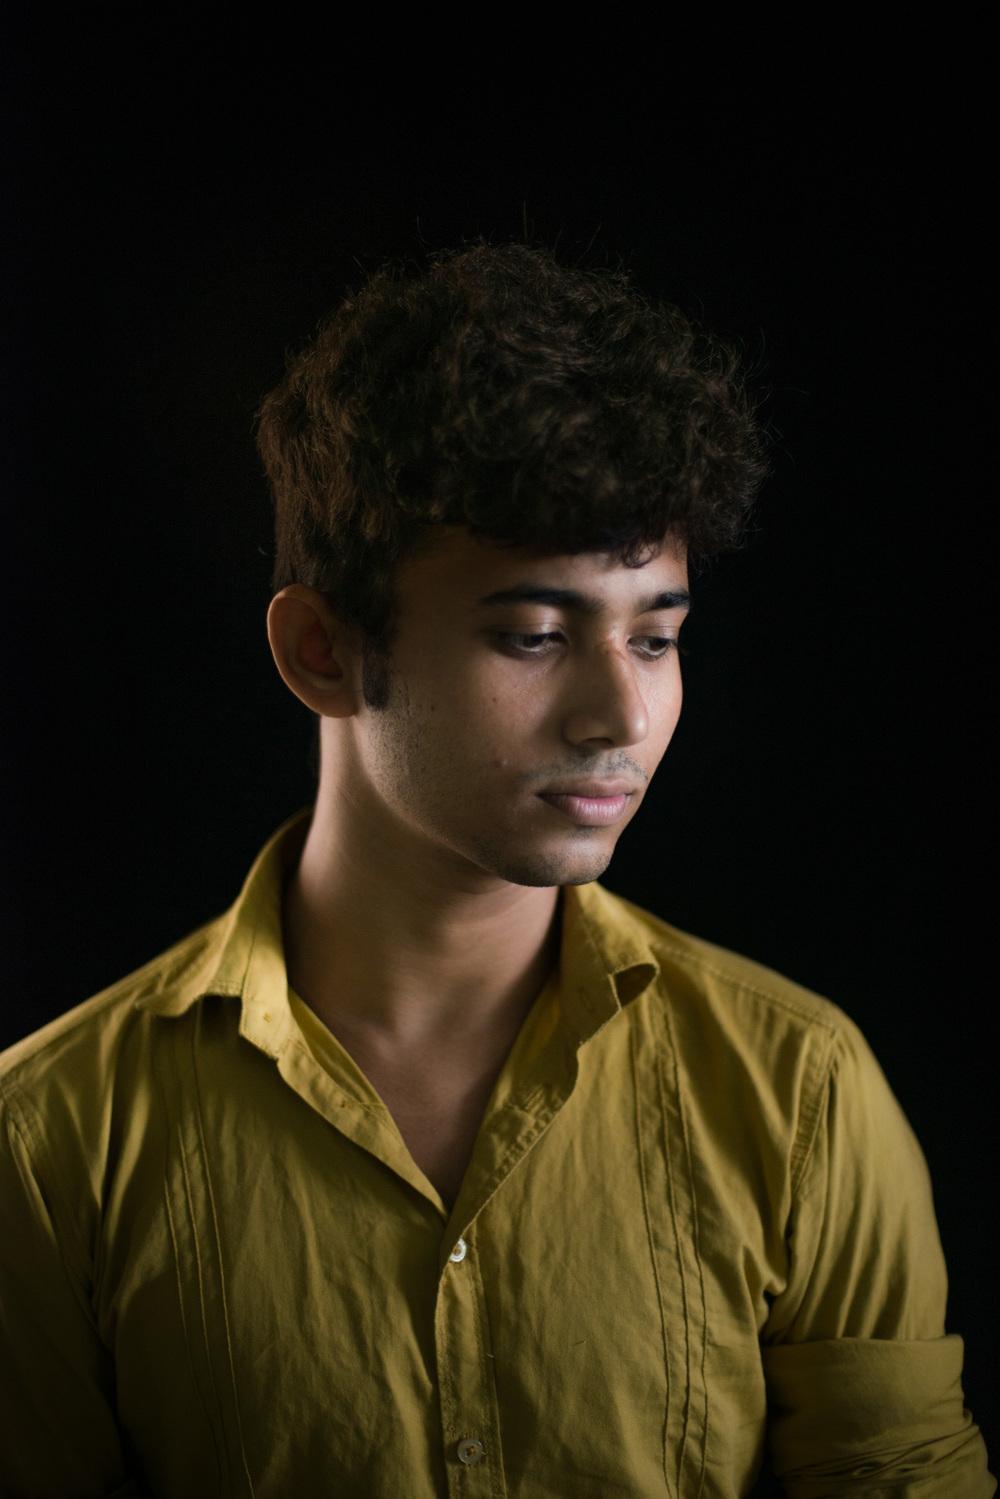 1_Chhandak Pradhan-portrait-bruised-child_sex_abuse_India.jpg